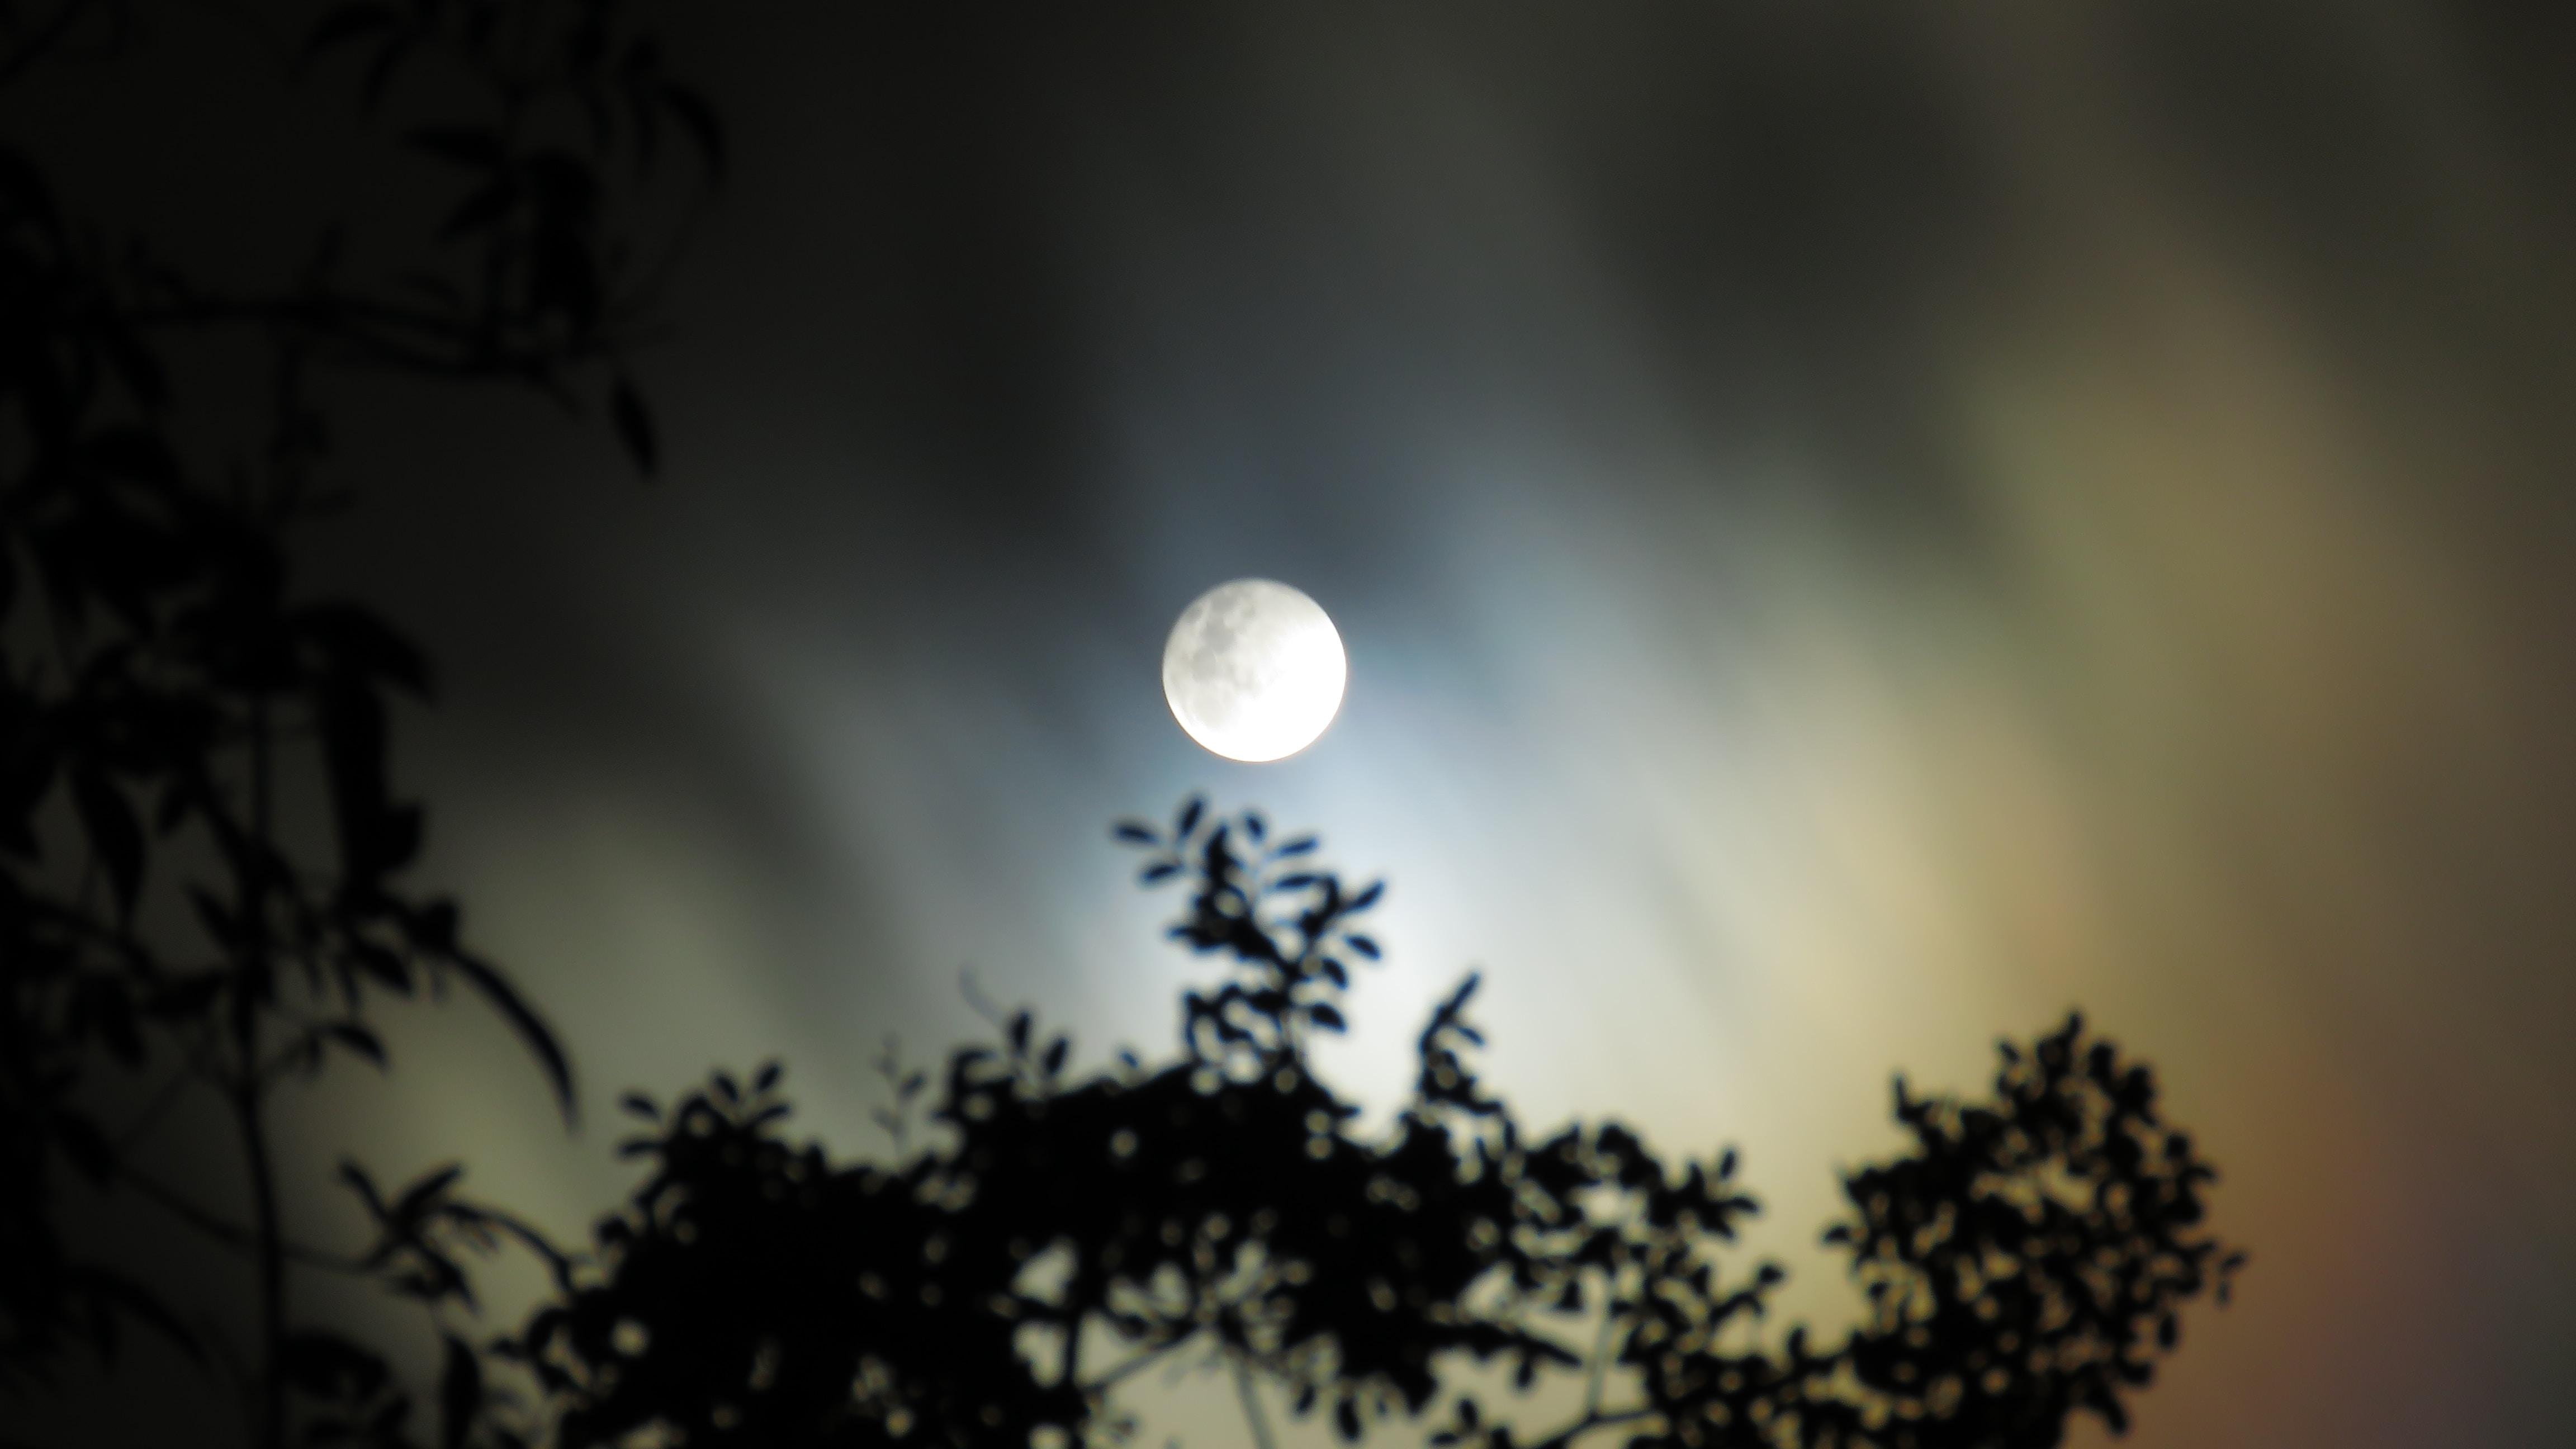 full moon in worm's eye view